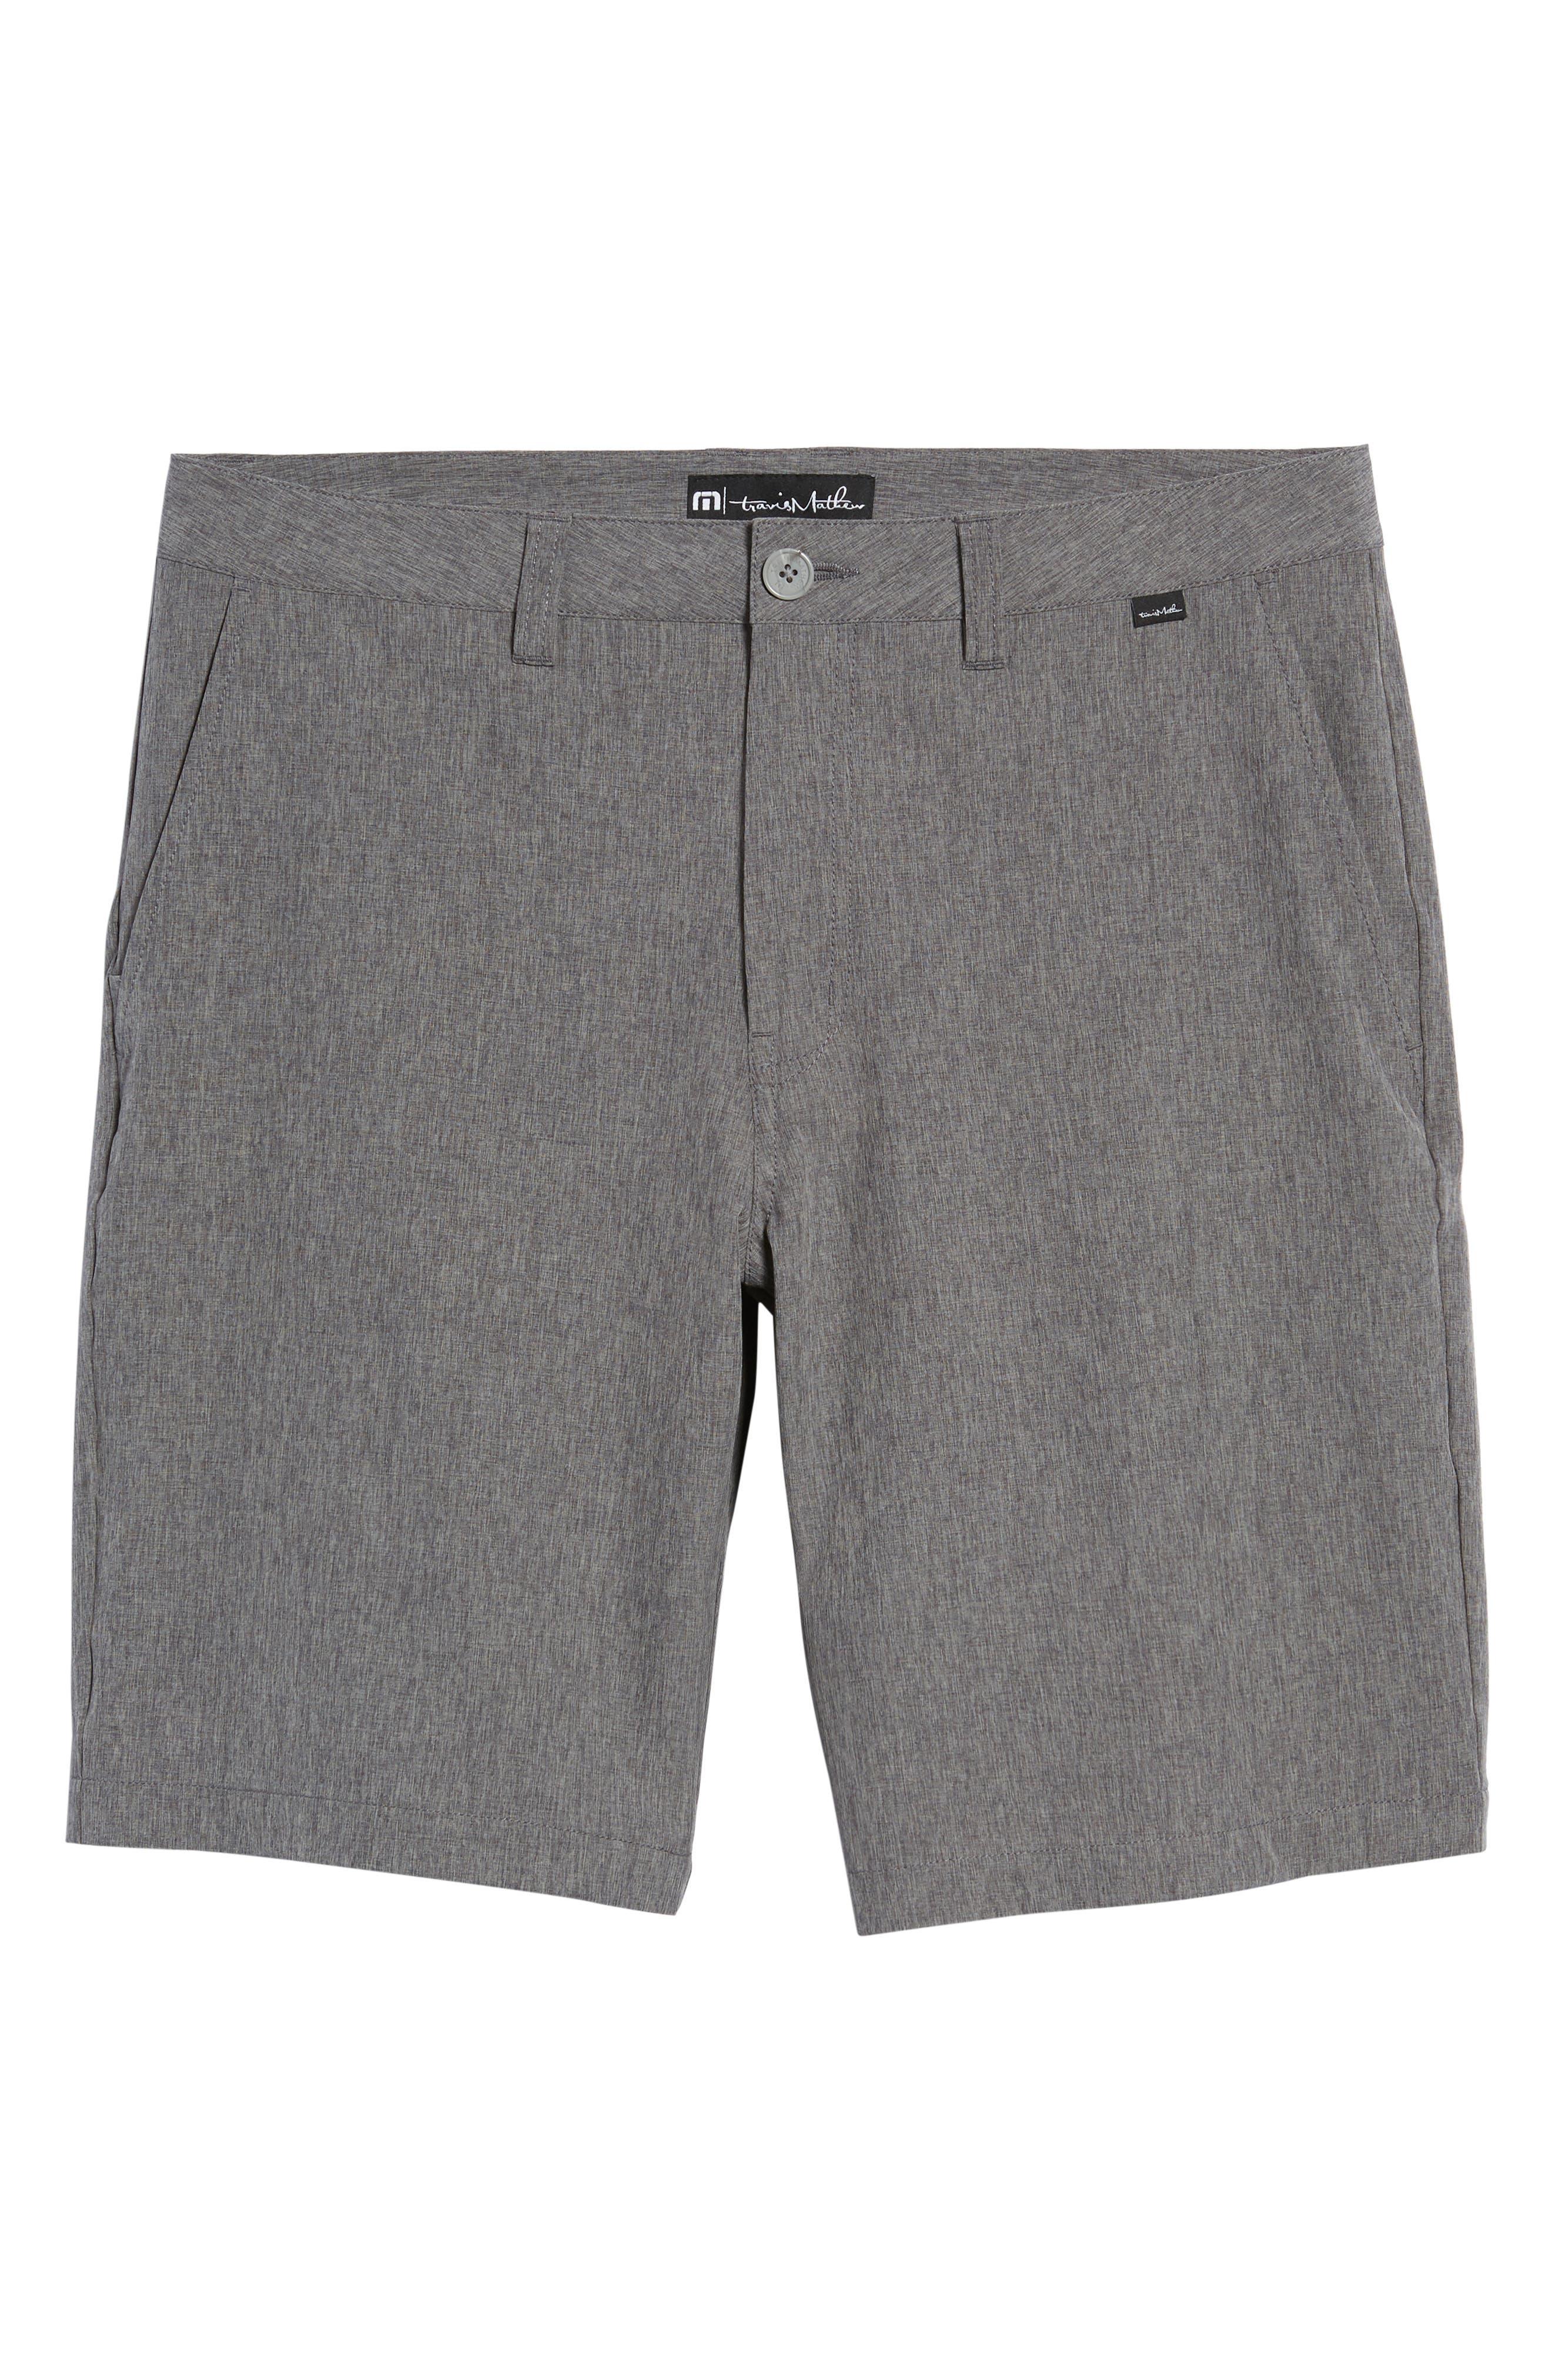 'Palladium' Performance Stretch Heathered Golf Shorts,                             Alternate thumbnail 6, color,                             021